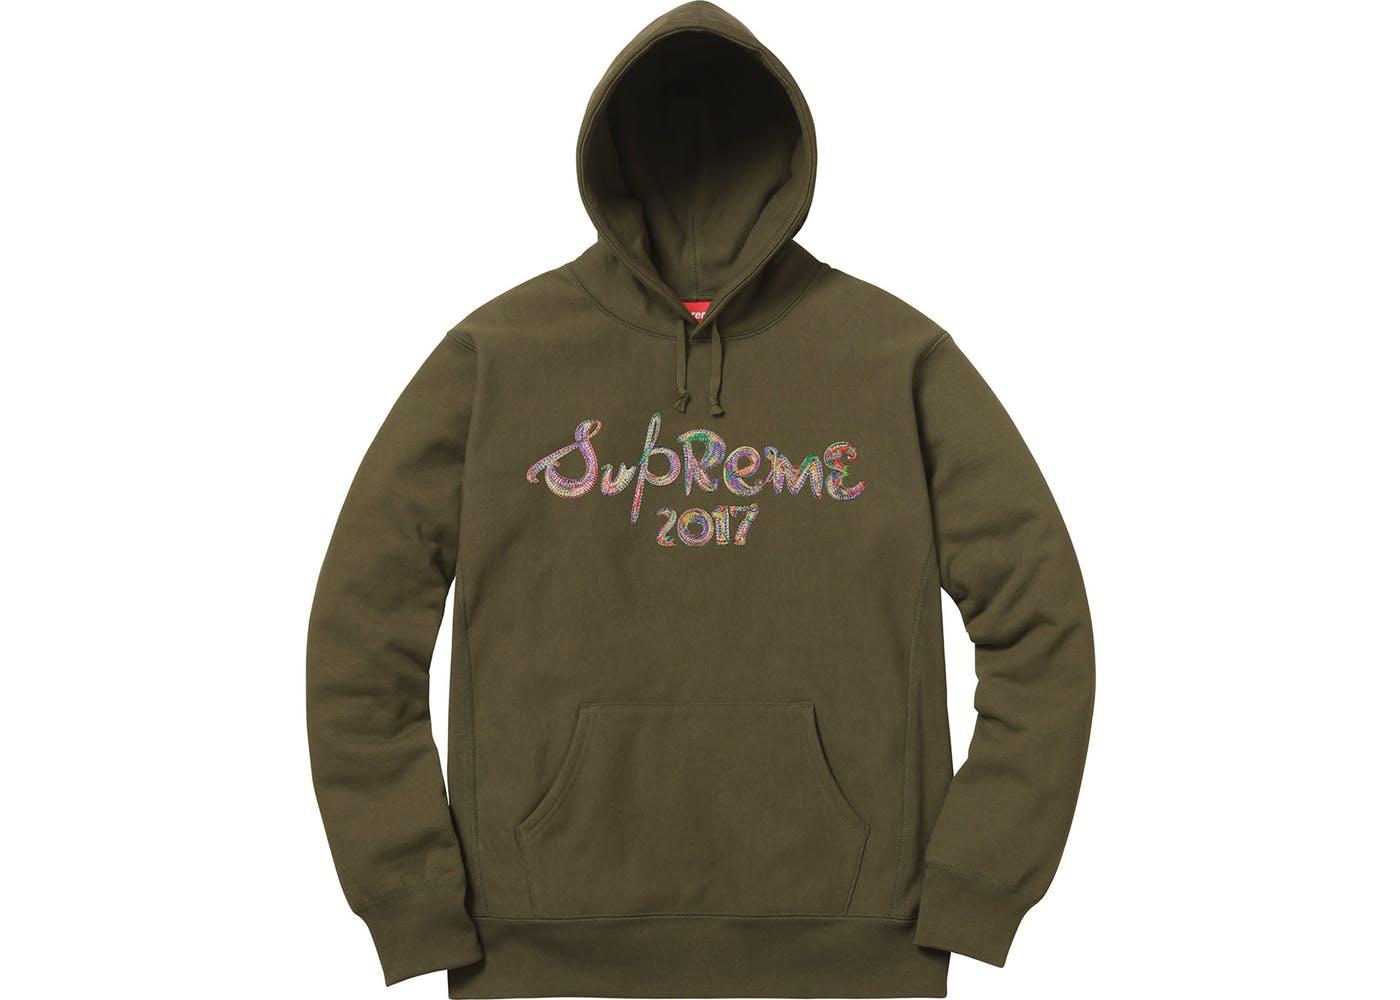 89830825d653 Supreme Brush Logo Hoodie Dark Olive - StockX News